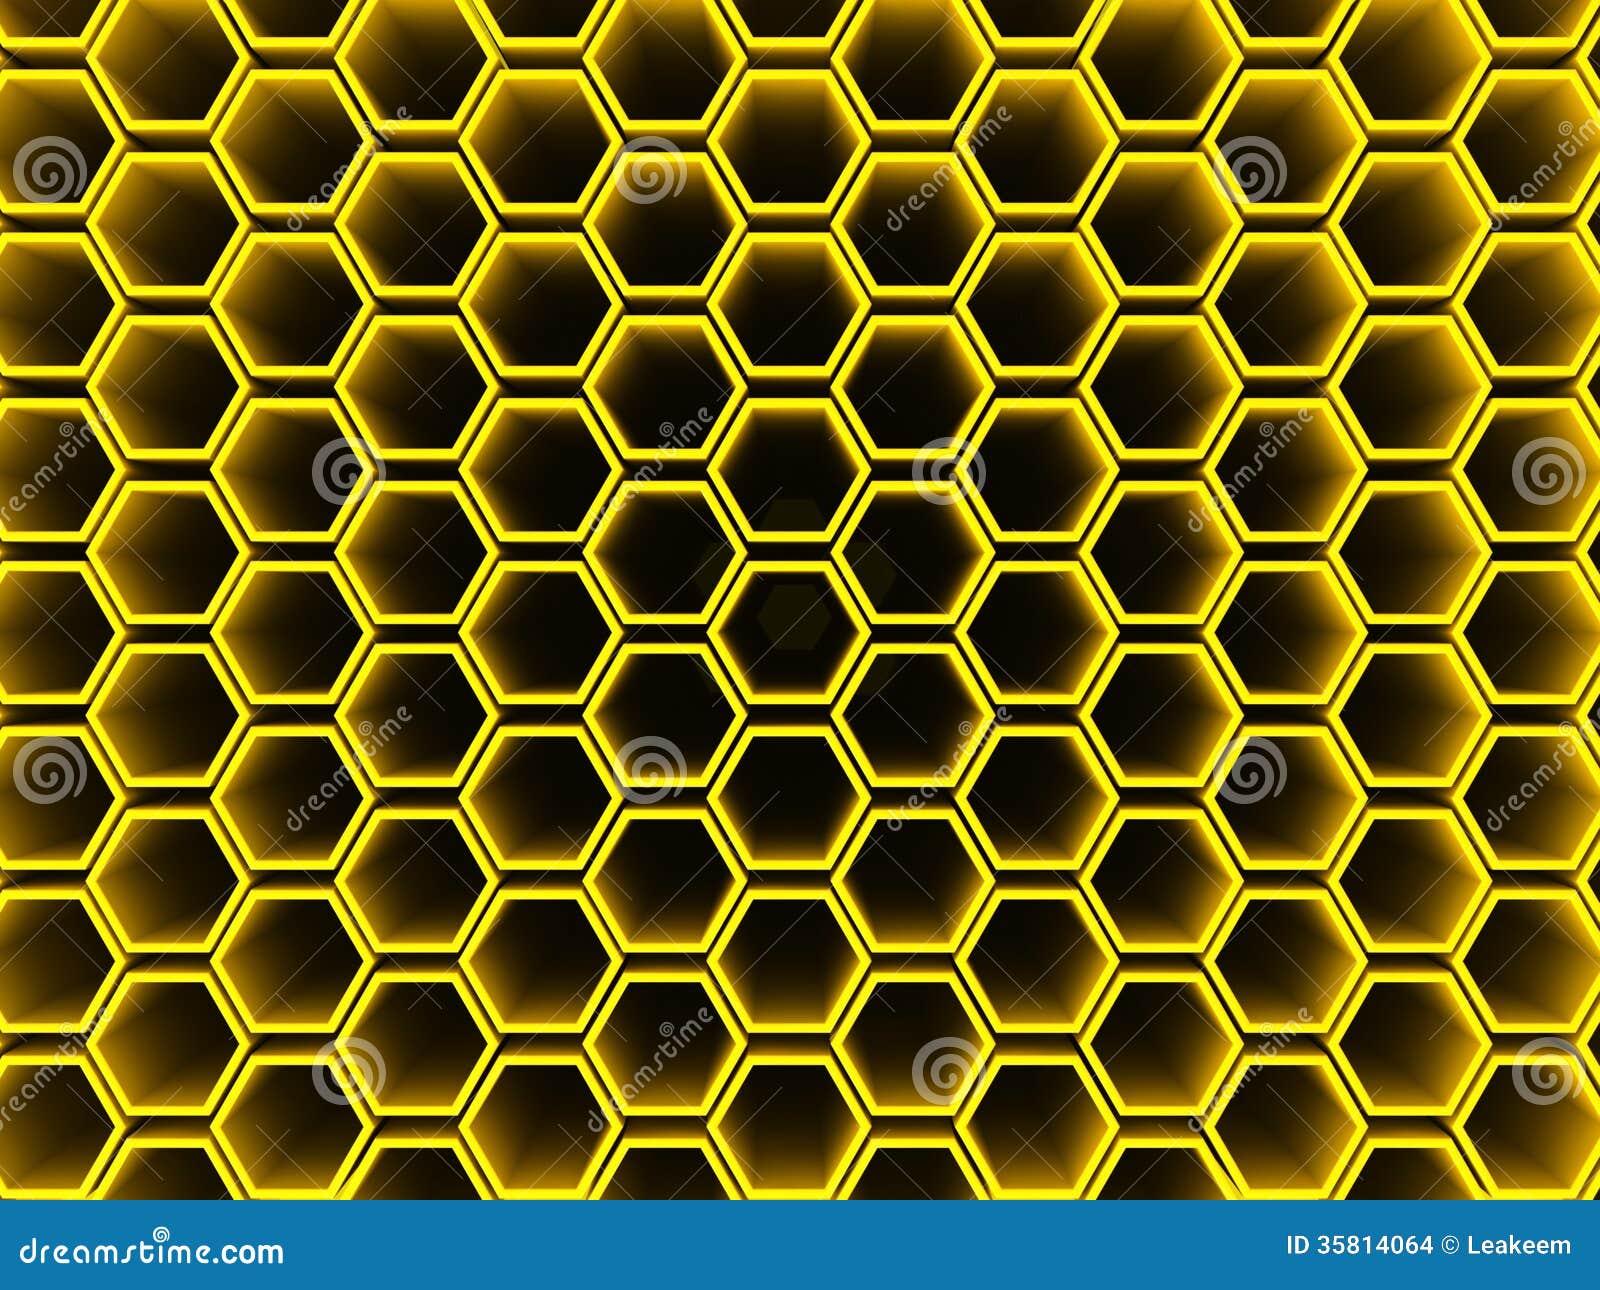 Hexagon Pattern Wallpaper Yellow